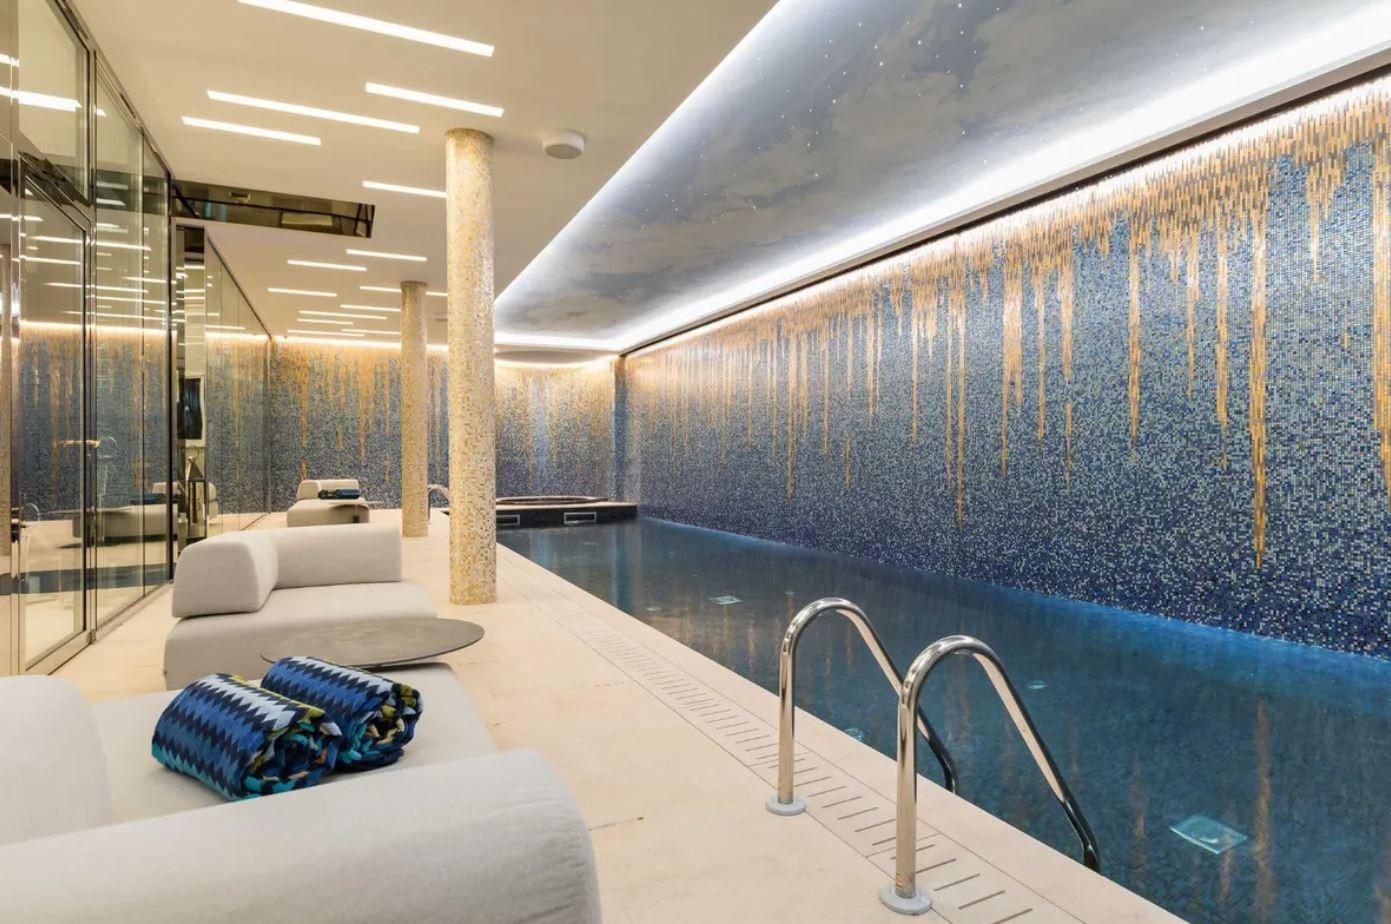 Indoor luxury pool